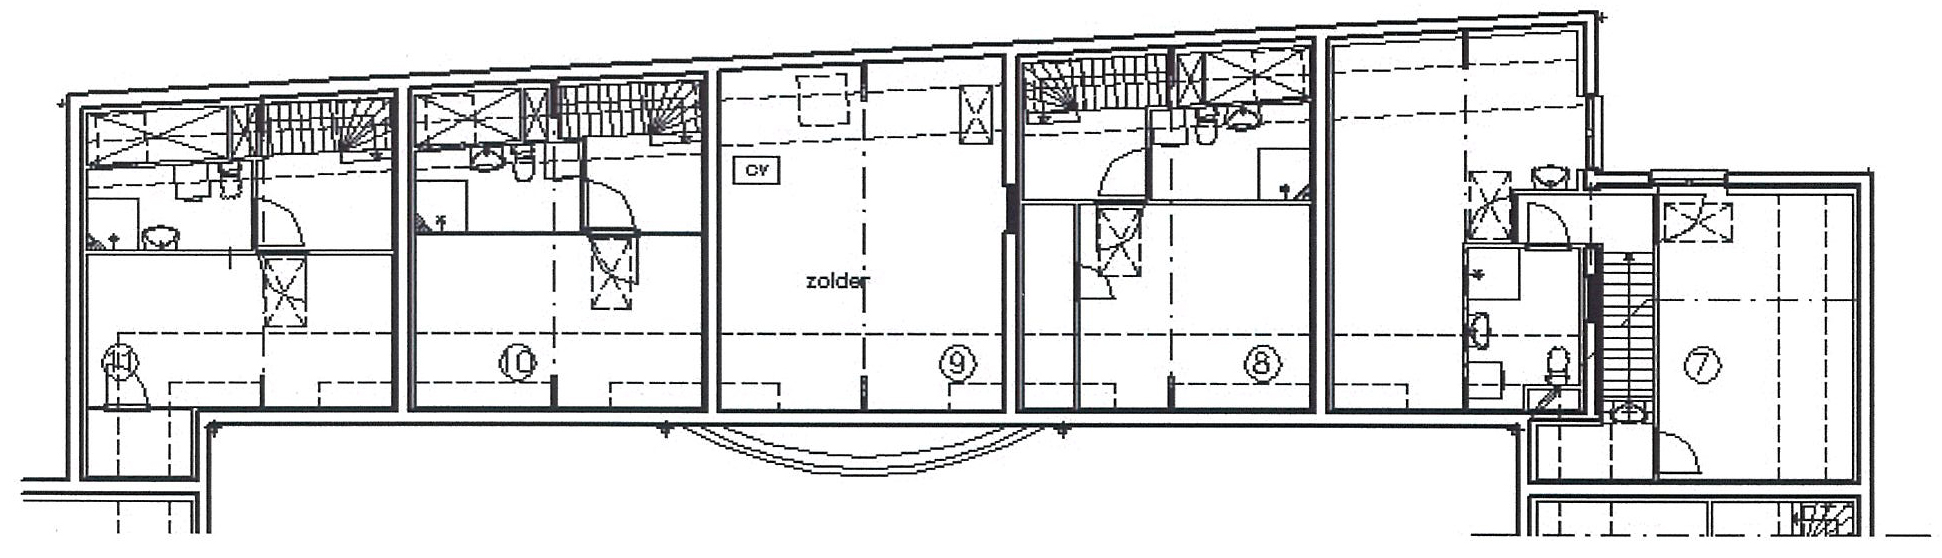 1e_verdieping.jpg